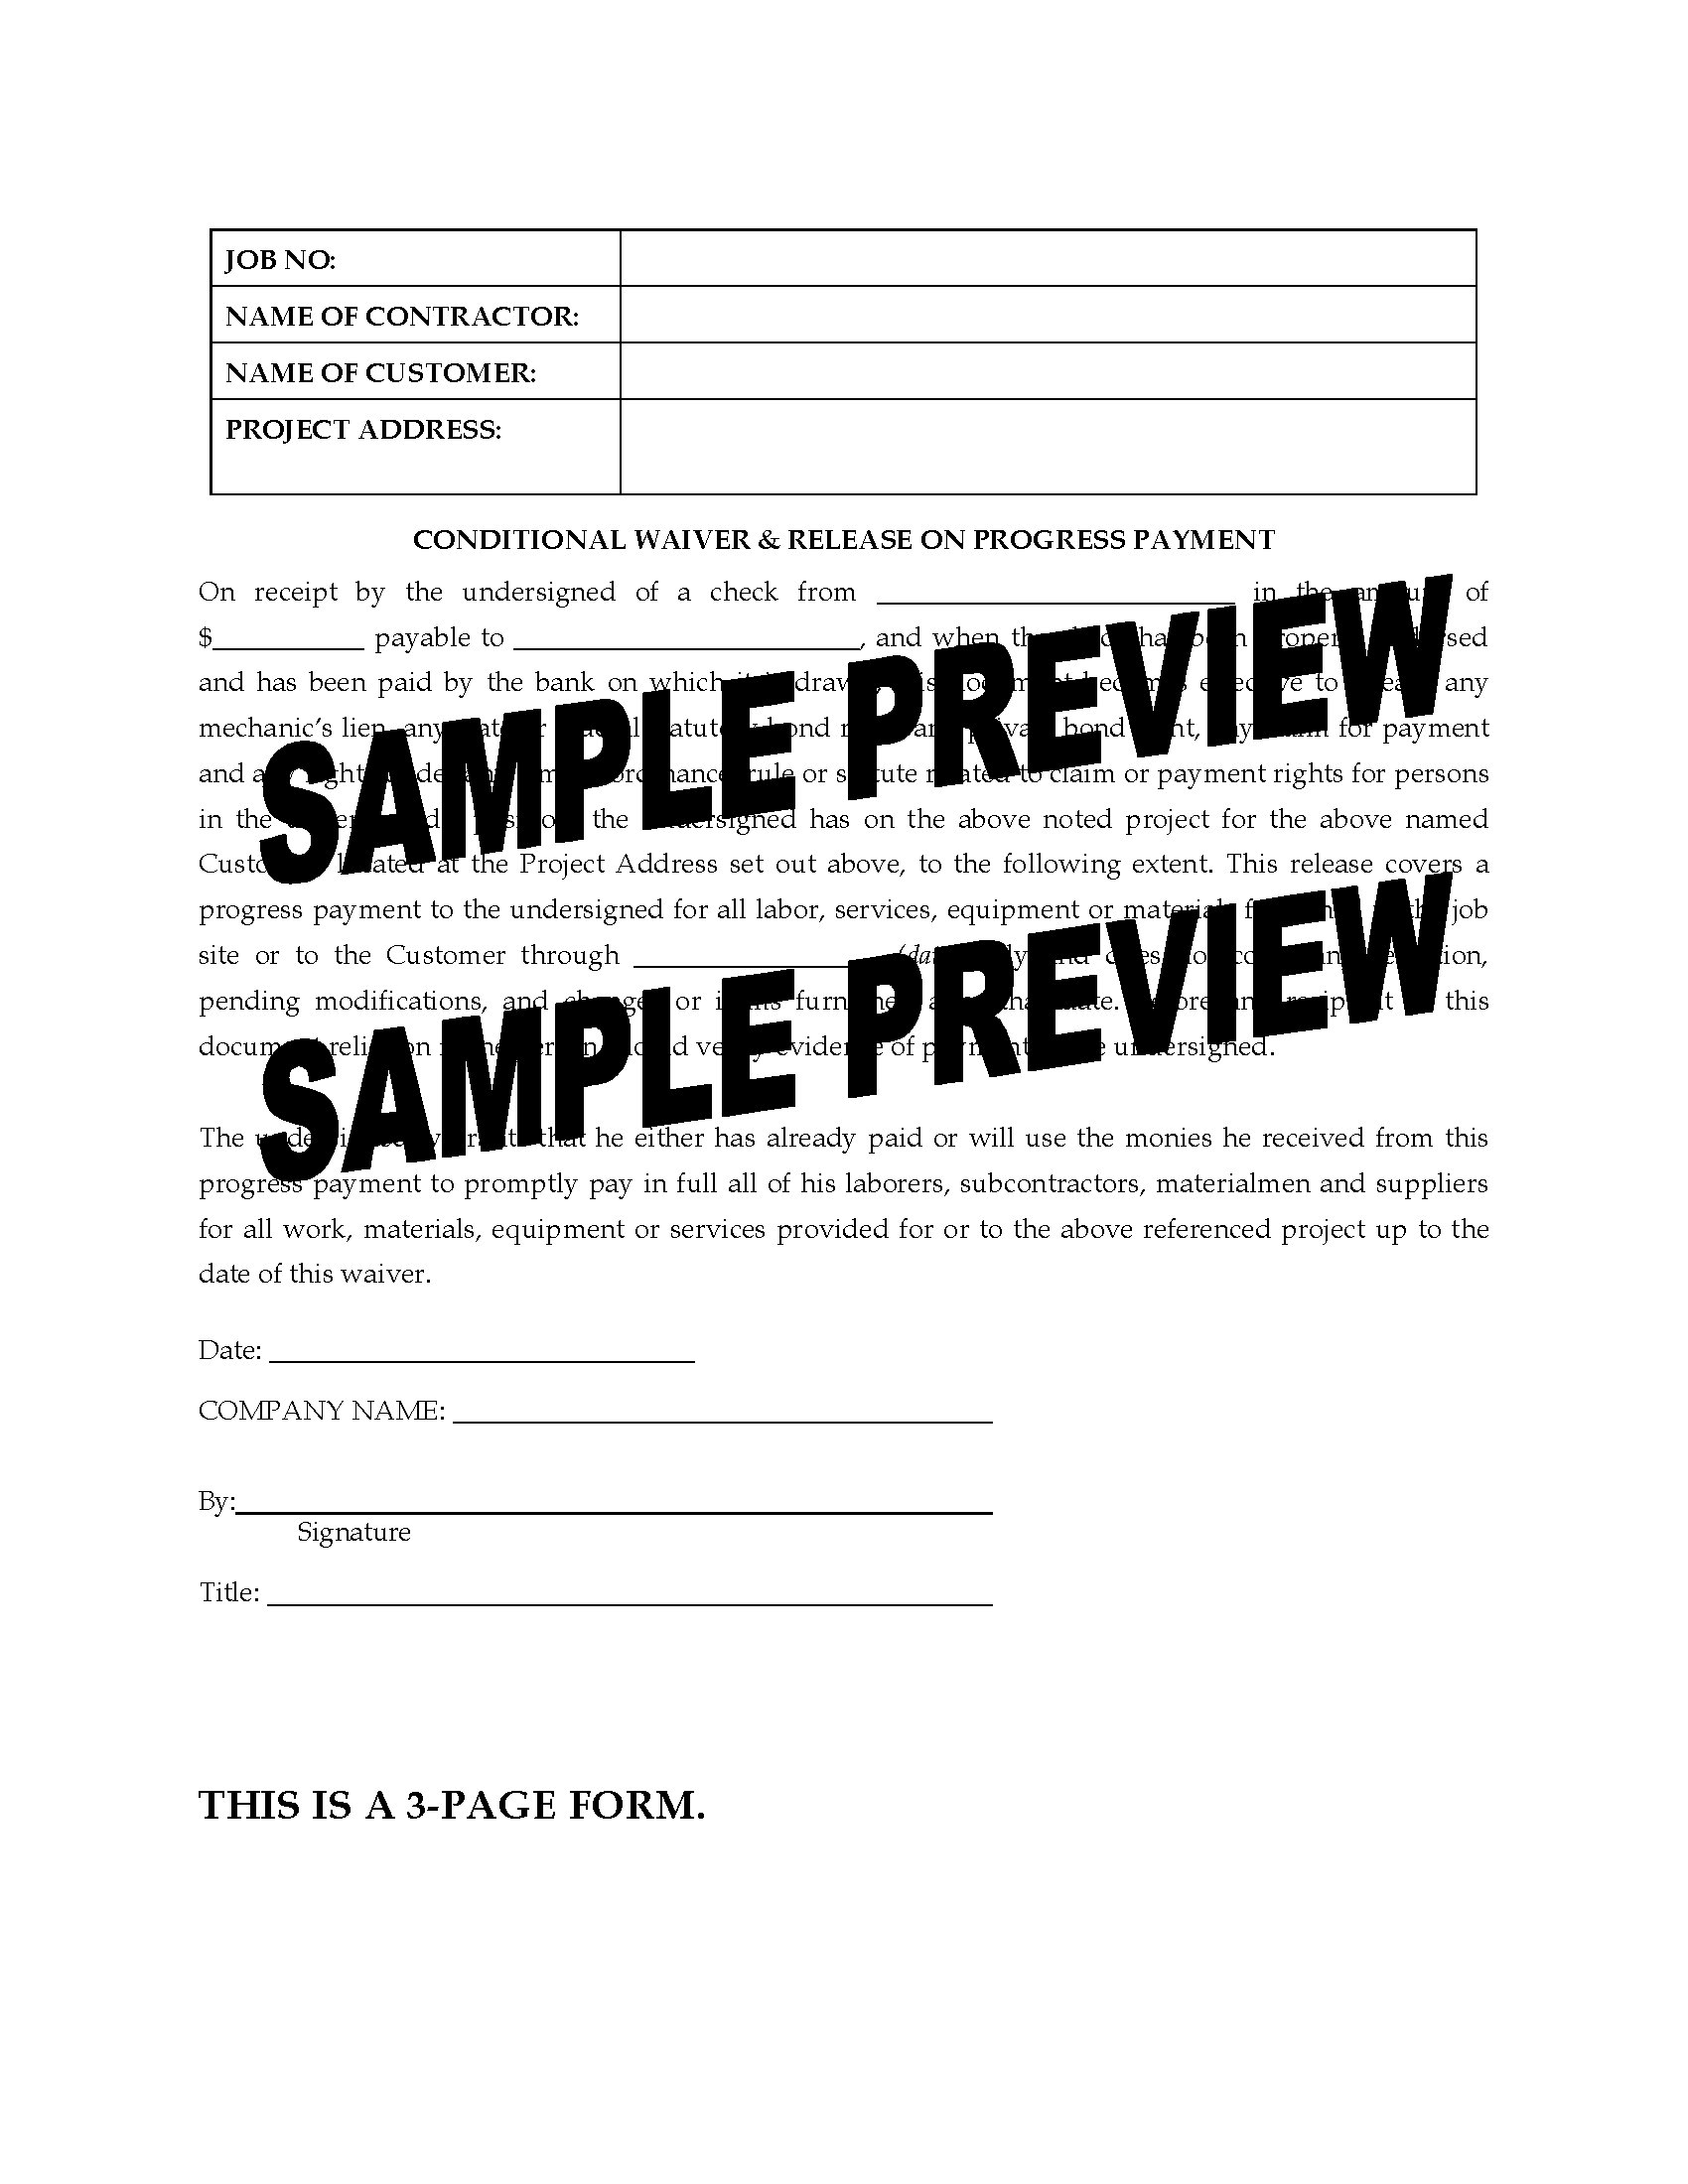 lien release forms